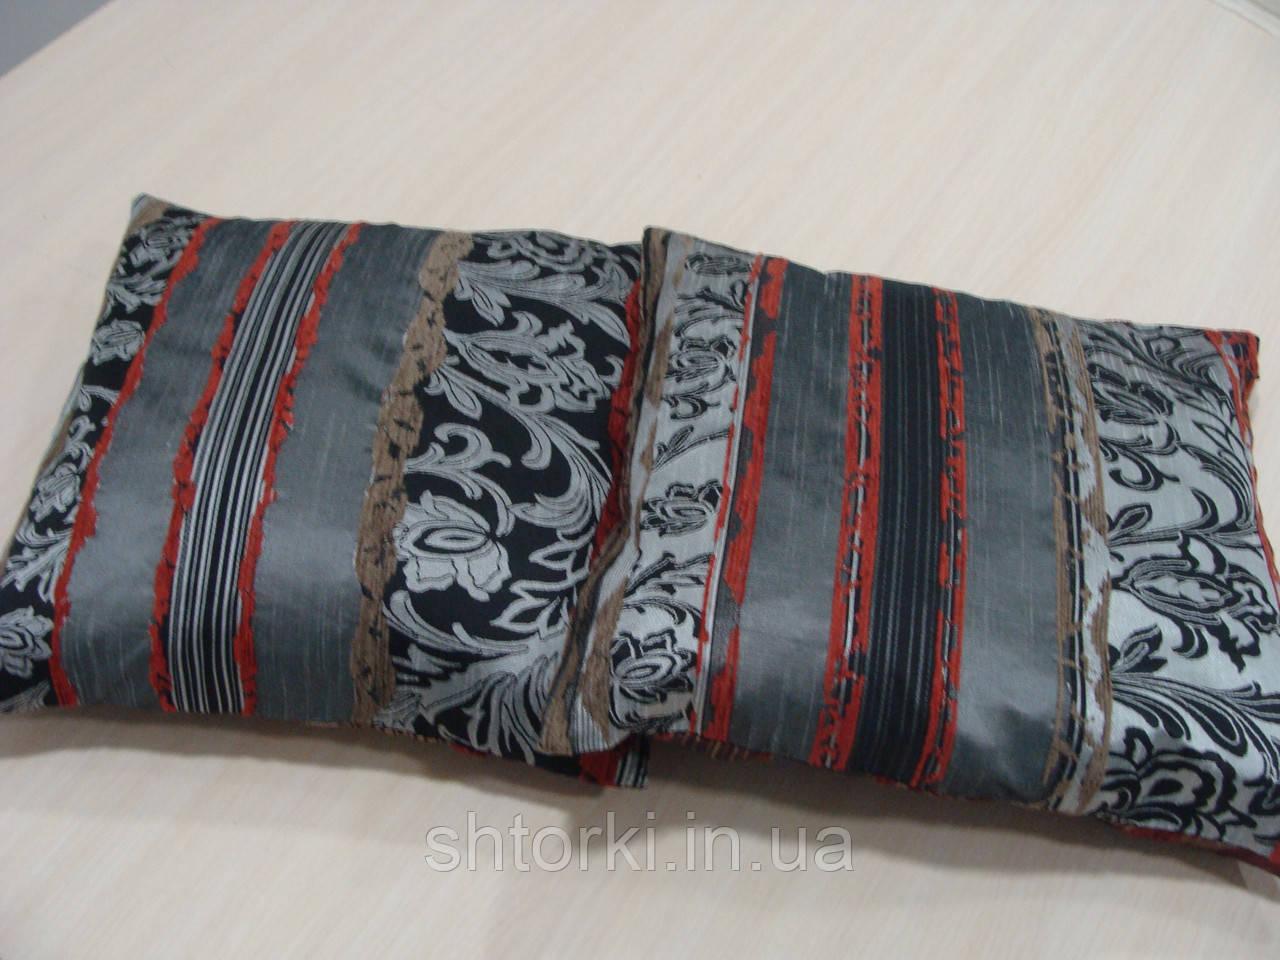 Комплект подушек Рельеф серебро и бордо , 2 шт